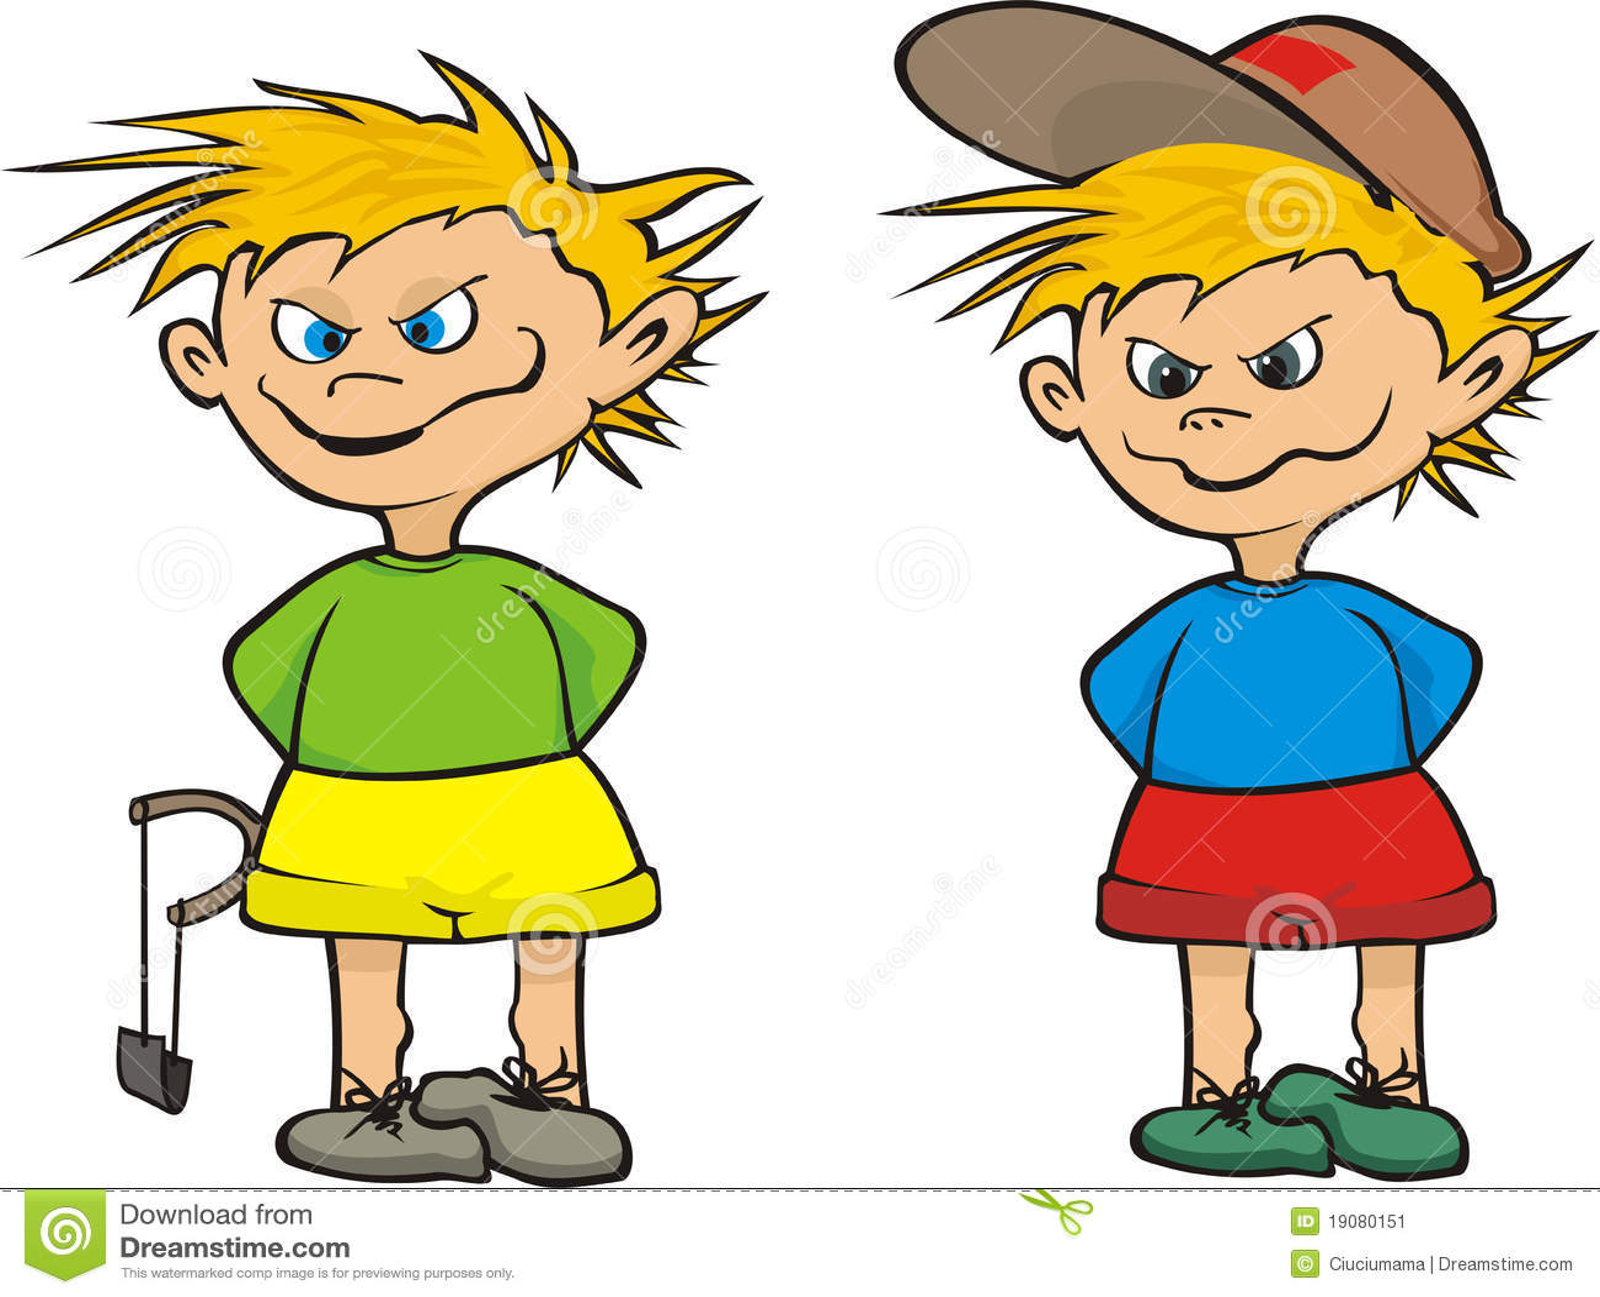 Street Urchin - Kid Stock Image - Image: 19080151